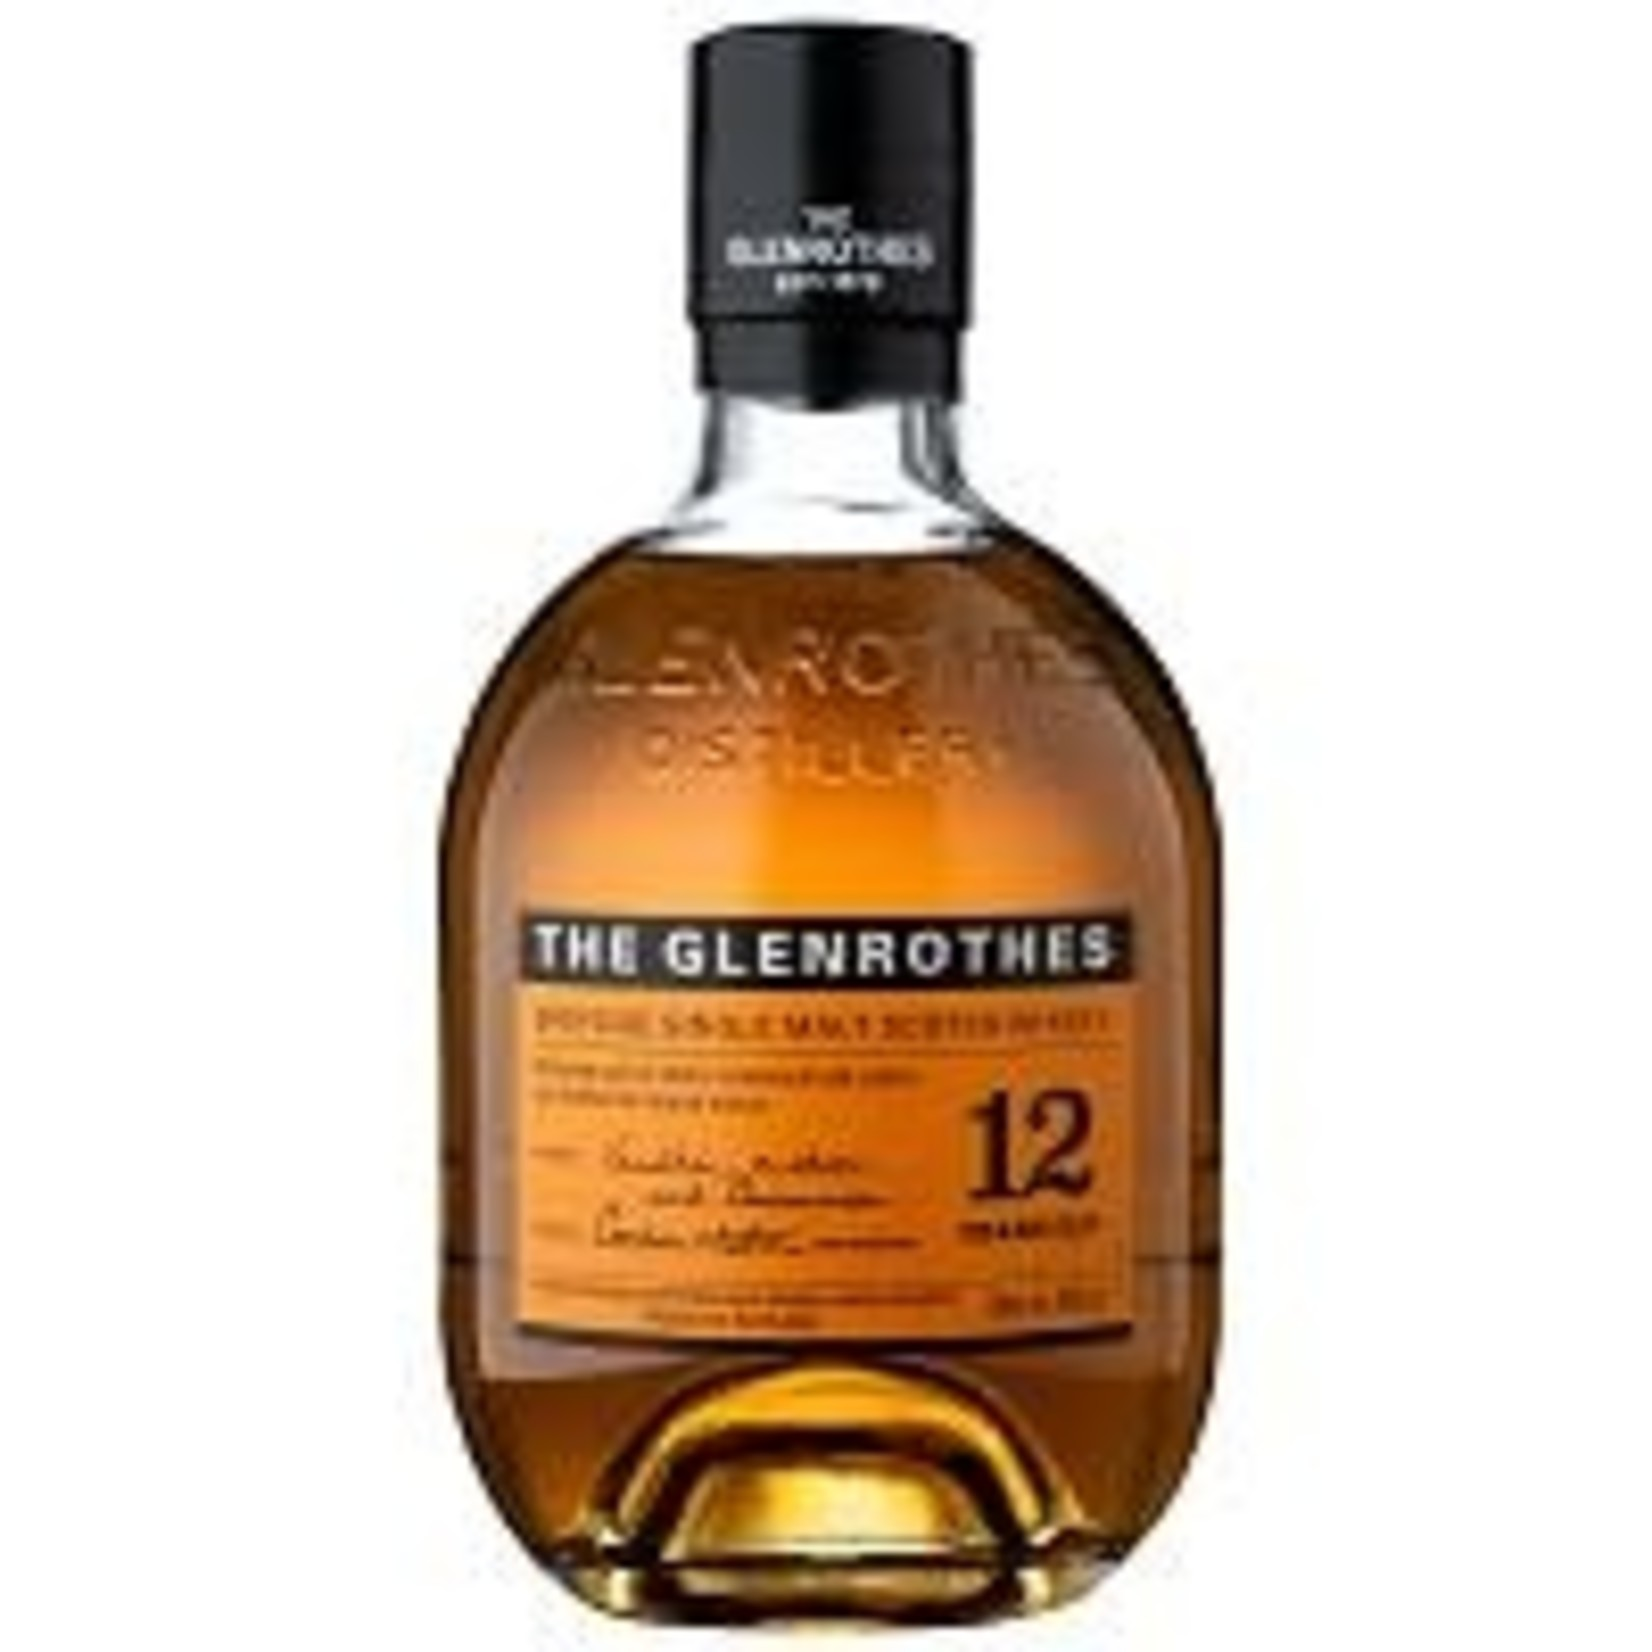 The Glenrothes Scotch Singe Malt 12 Year